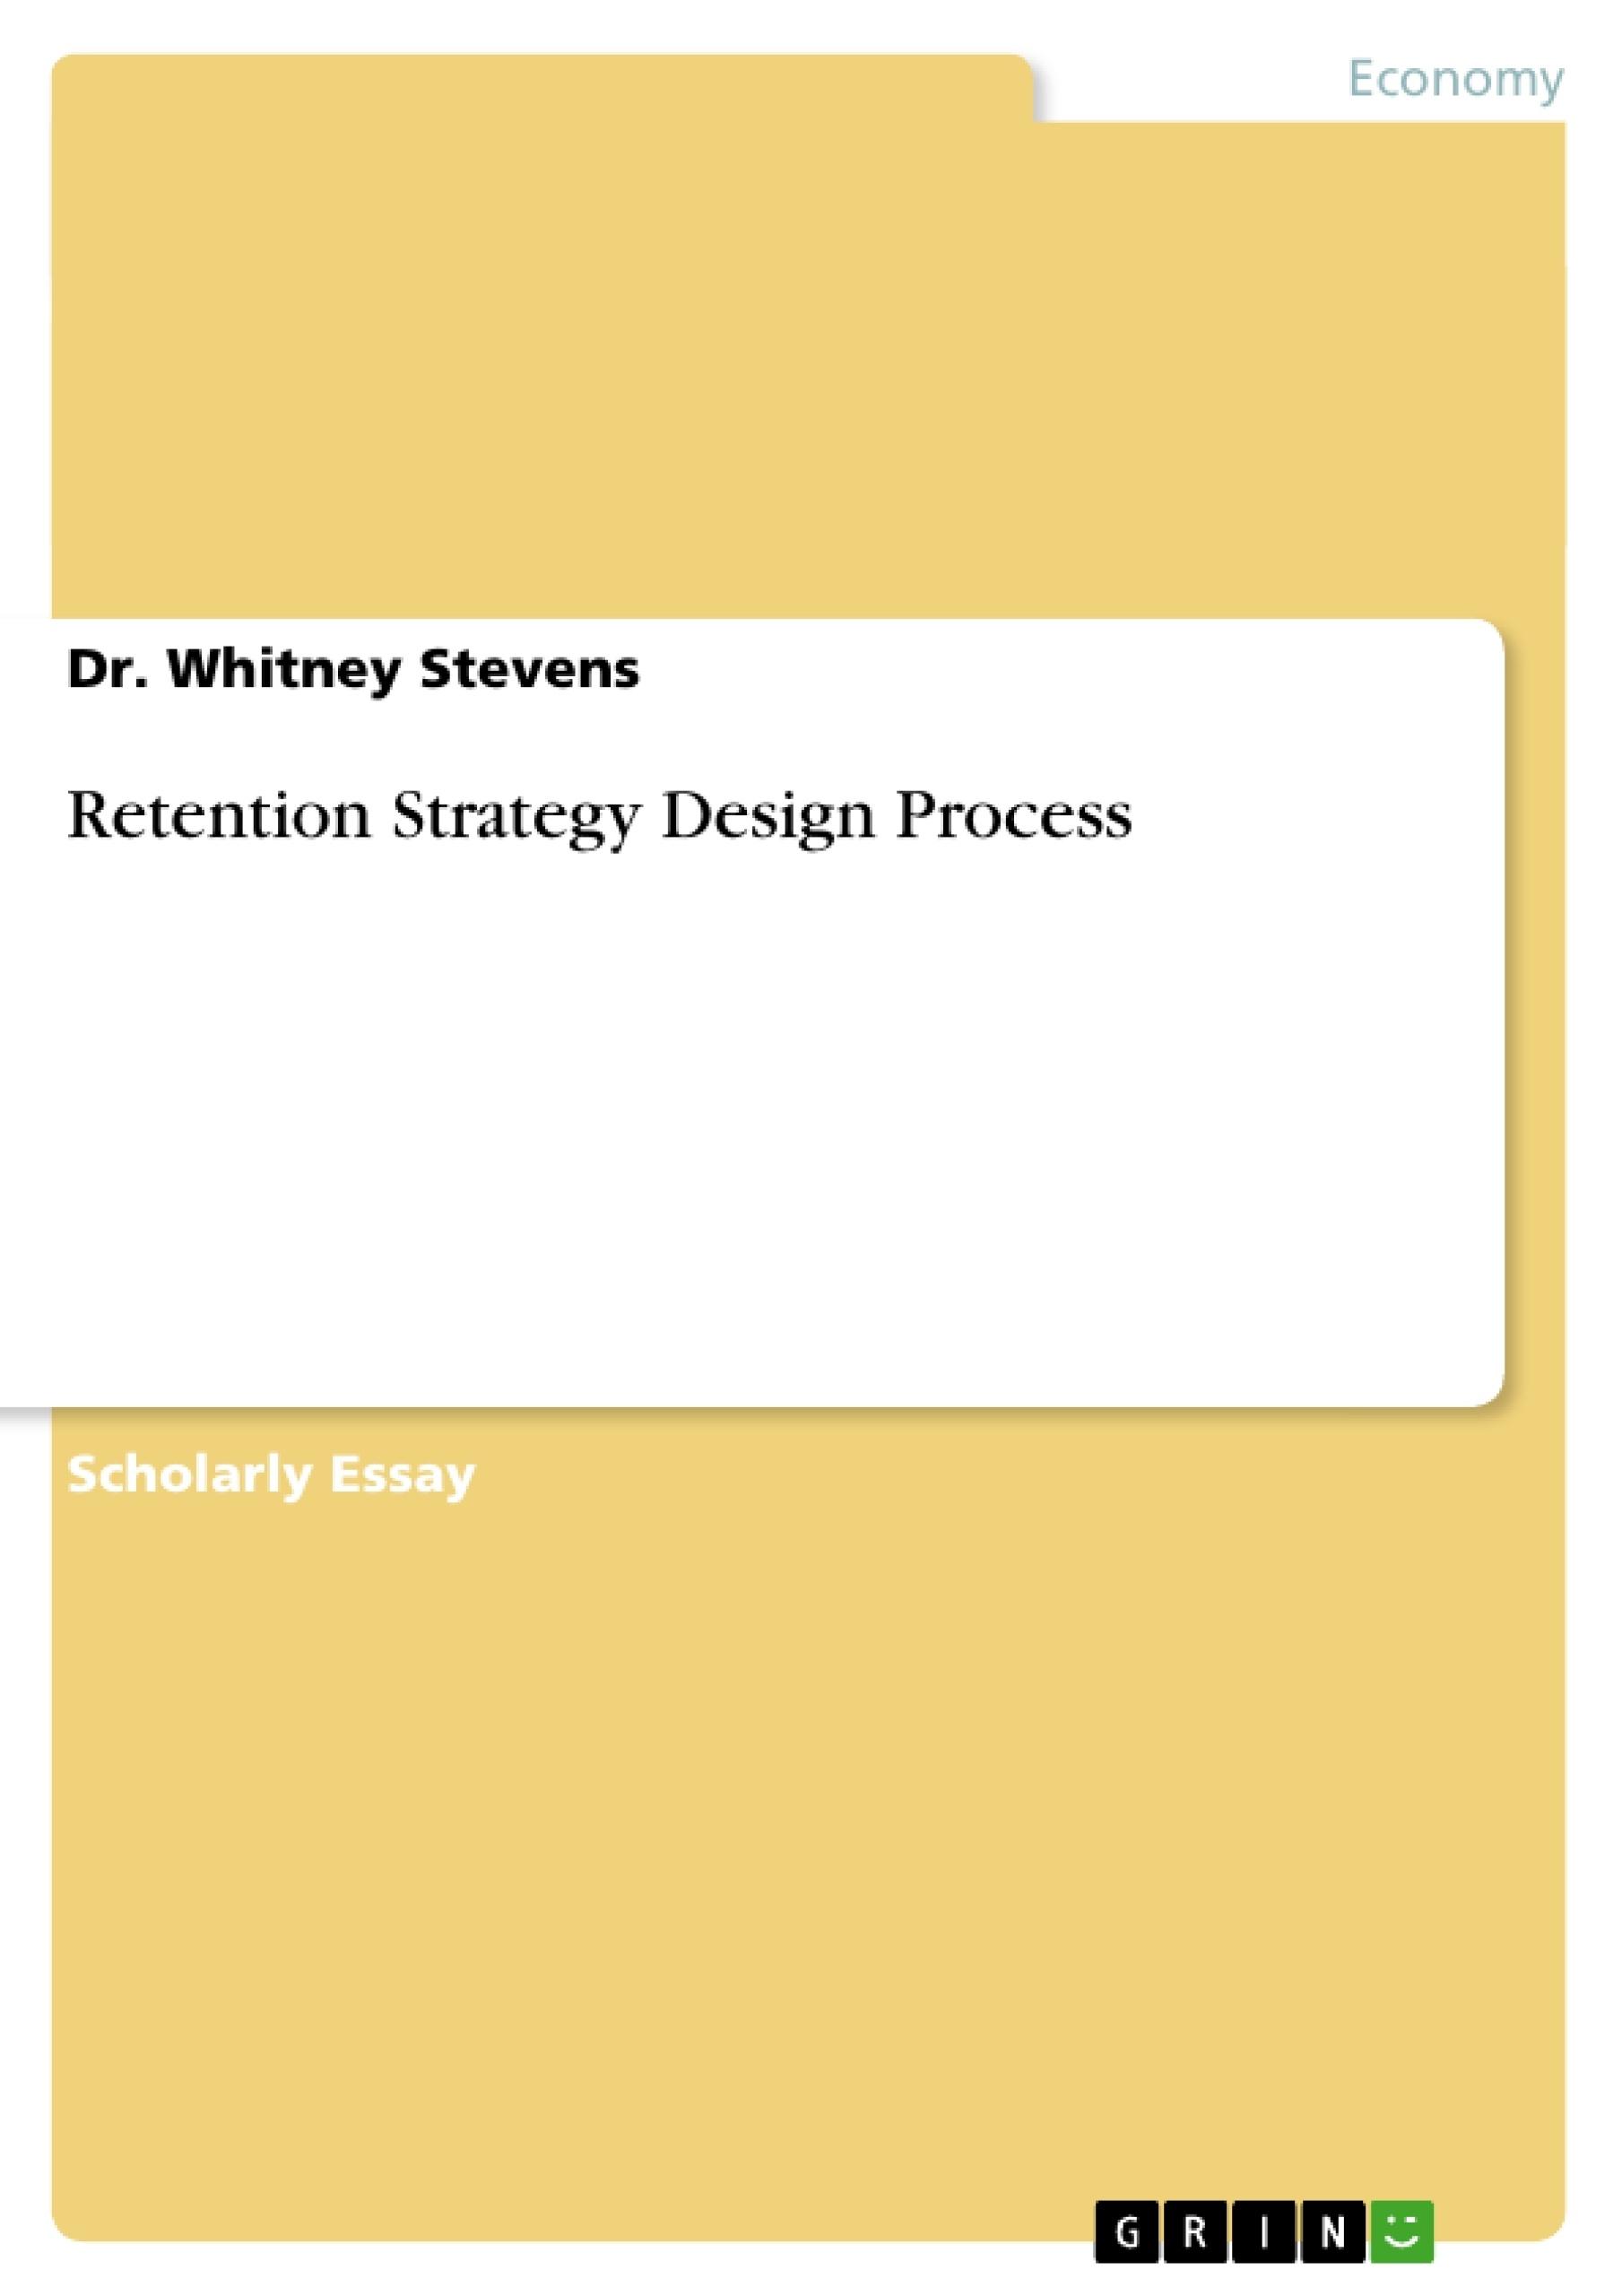 Title: Retention Strategy Design Process